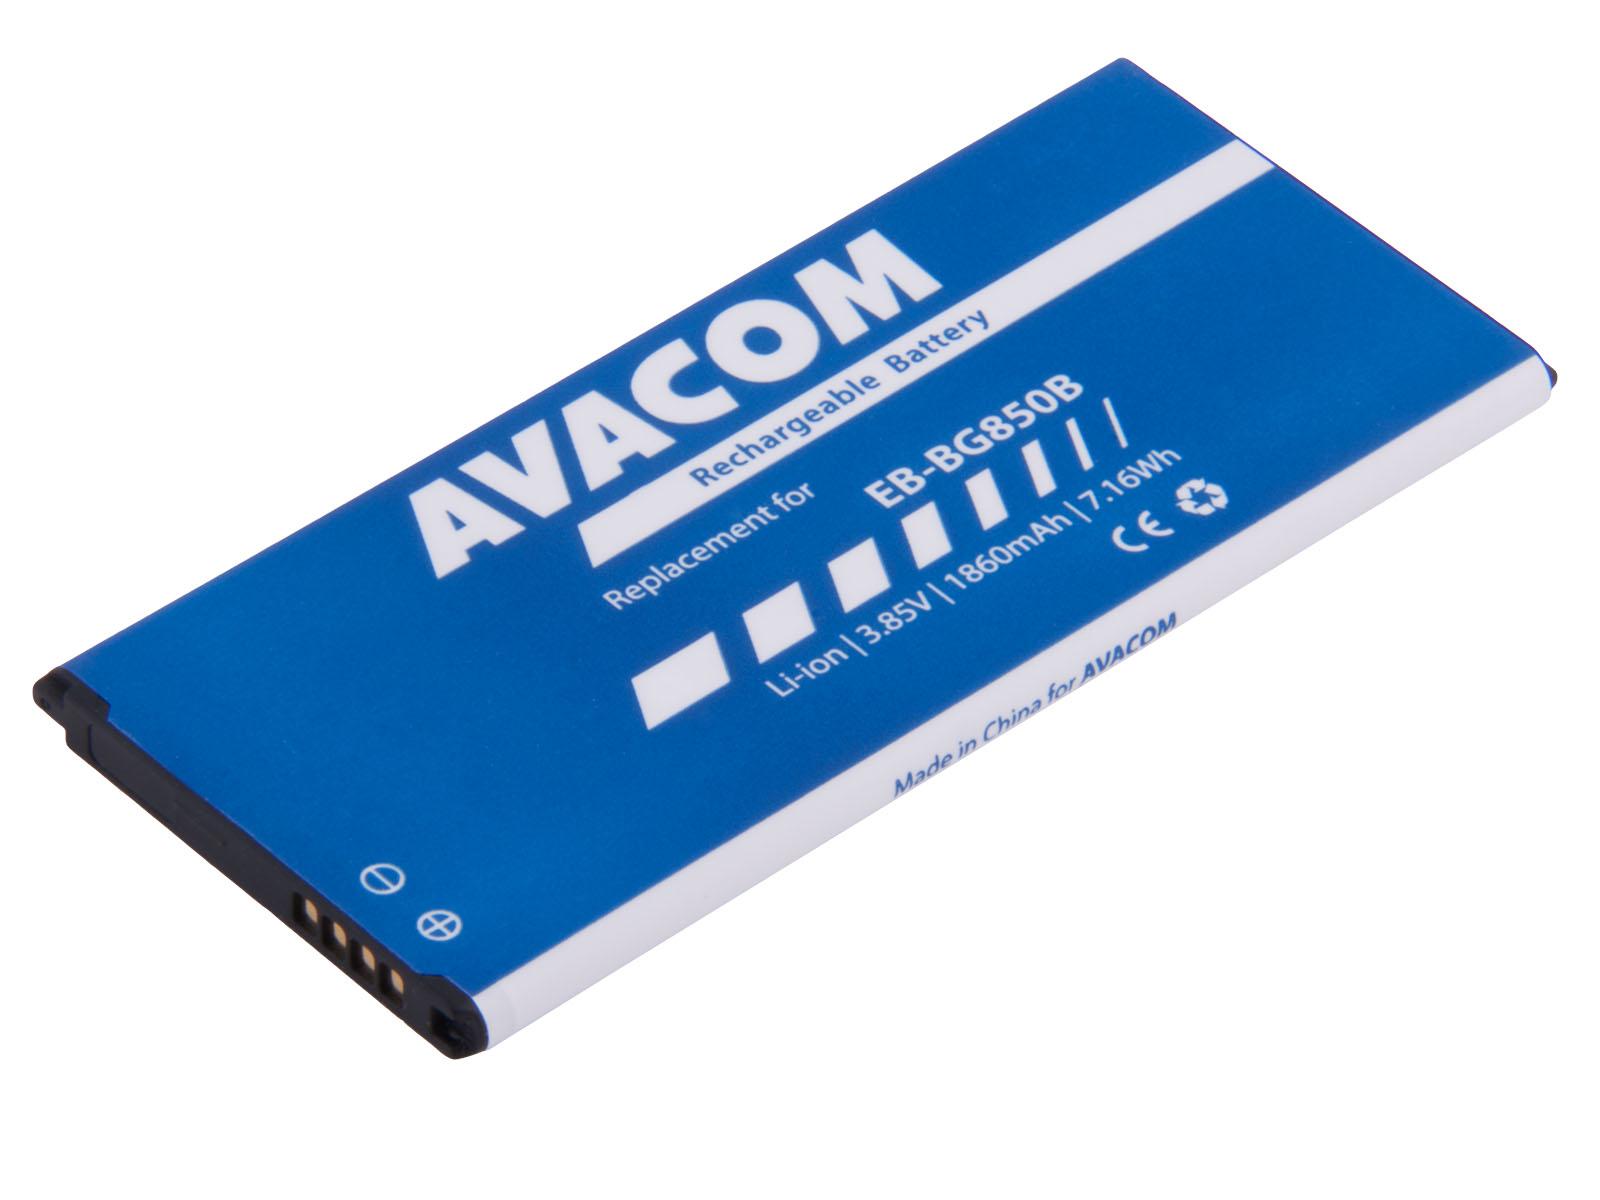 Baterie AVACOM GSSA-G850-1860 do mobilu Samsung G850 Galaxy Alpha Li-Ion 3,85V 1860mAh - GSSA-G850-1860